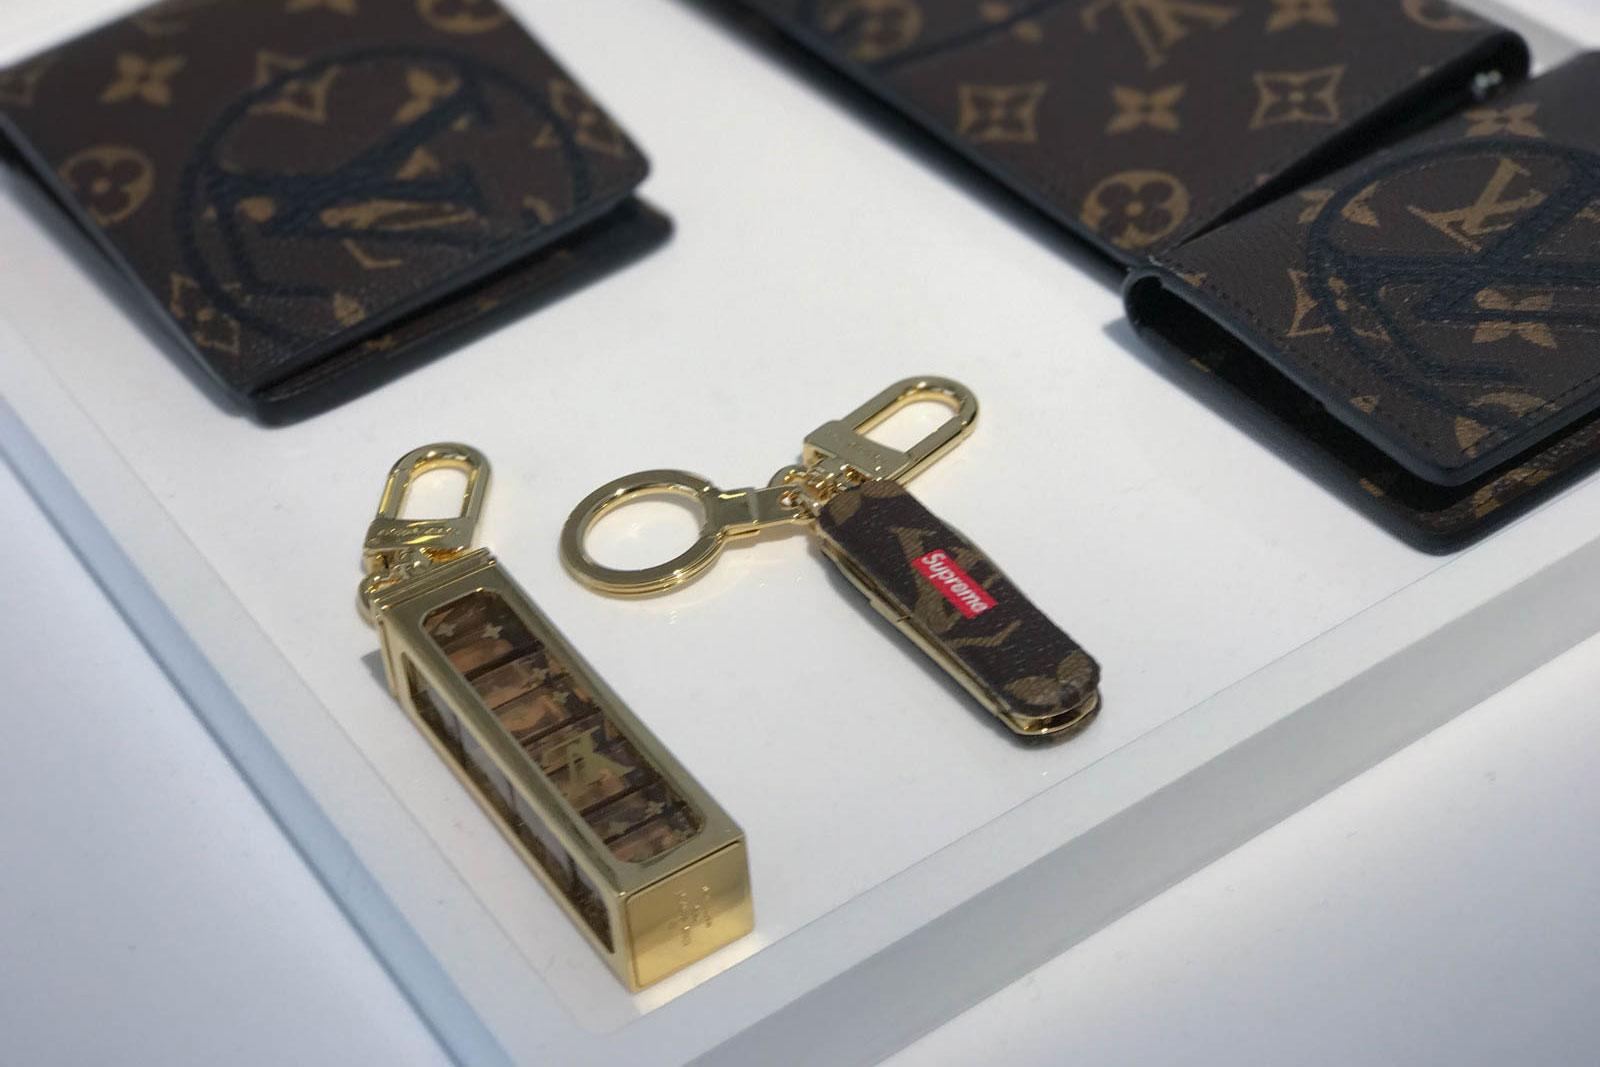 Supreme x Louis Vuitton 2017 Fall/Winter Closer Look Showroom - 3703537